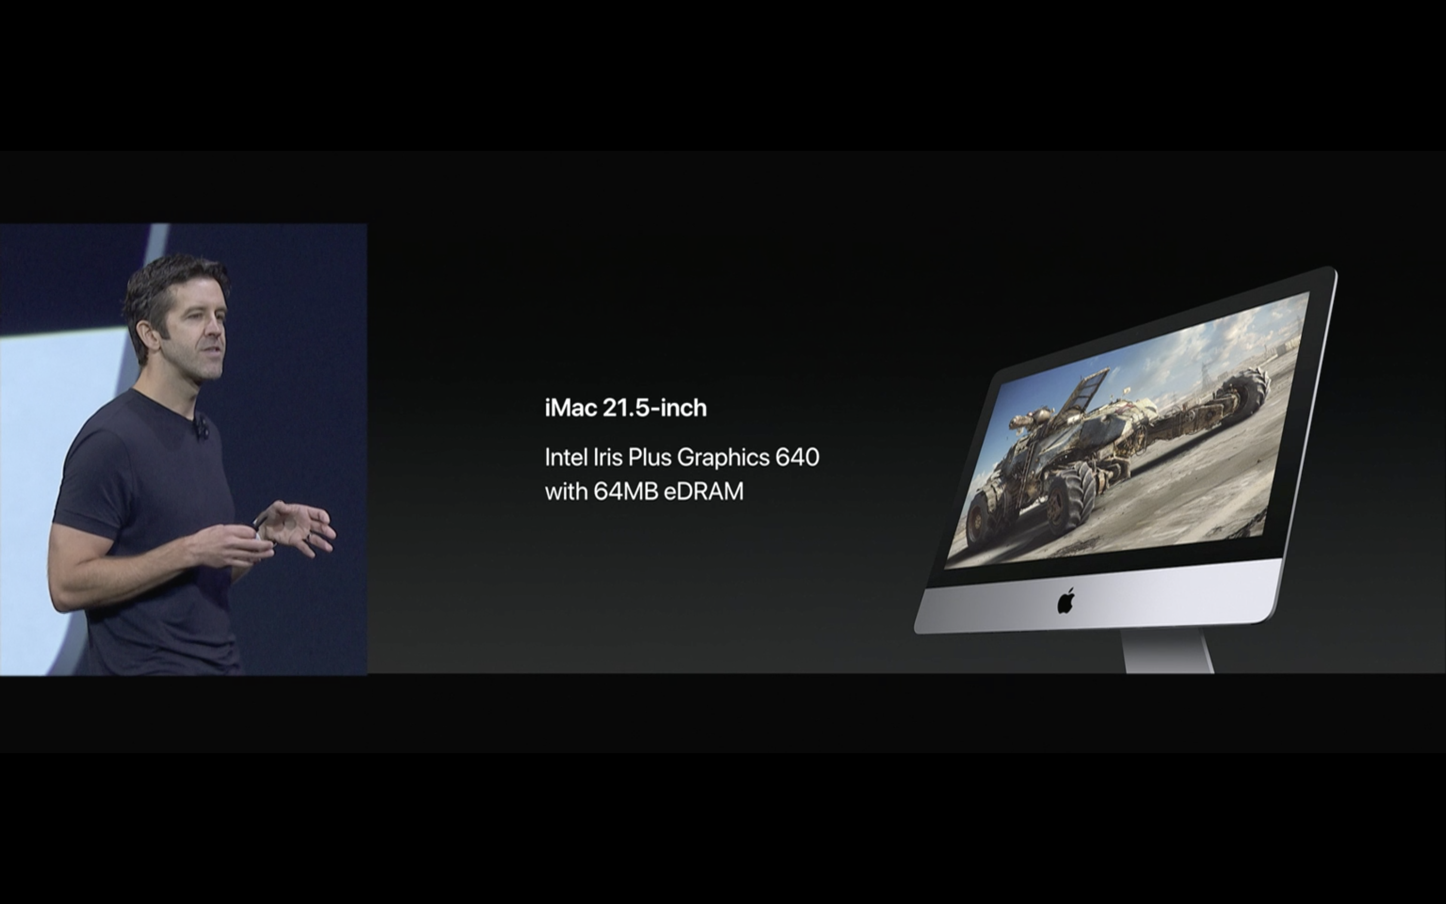 New-iMac-2017-WWDC17-12.png